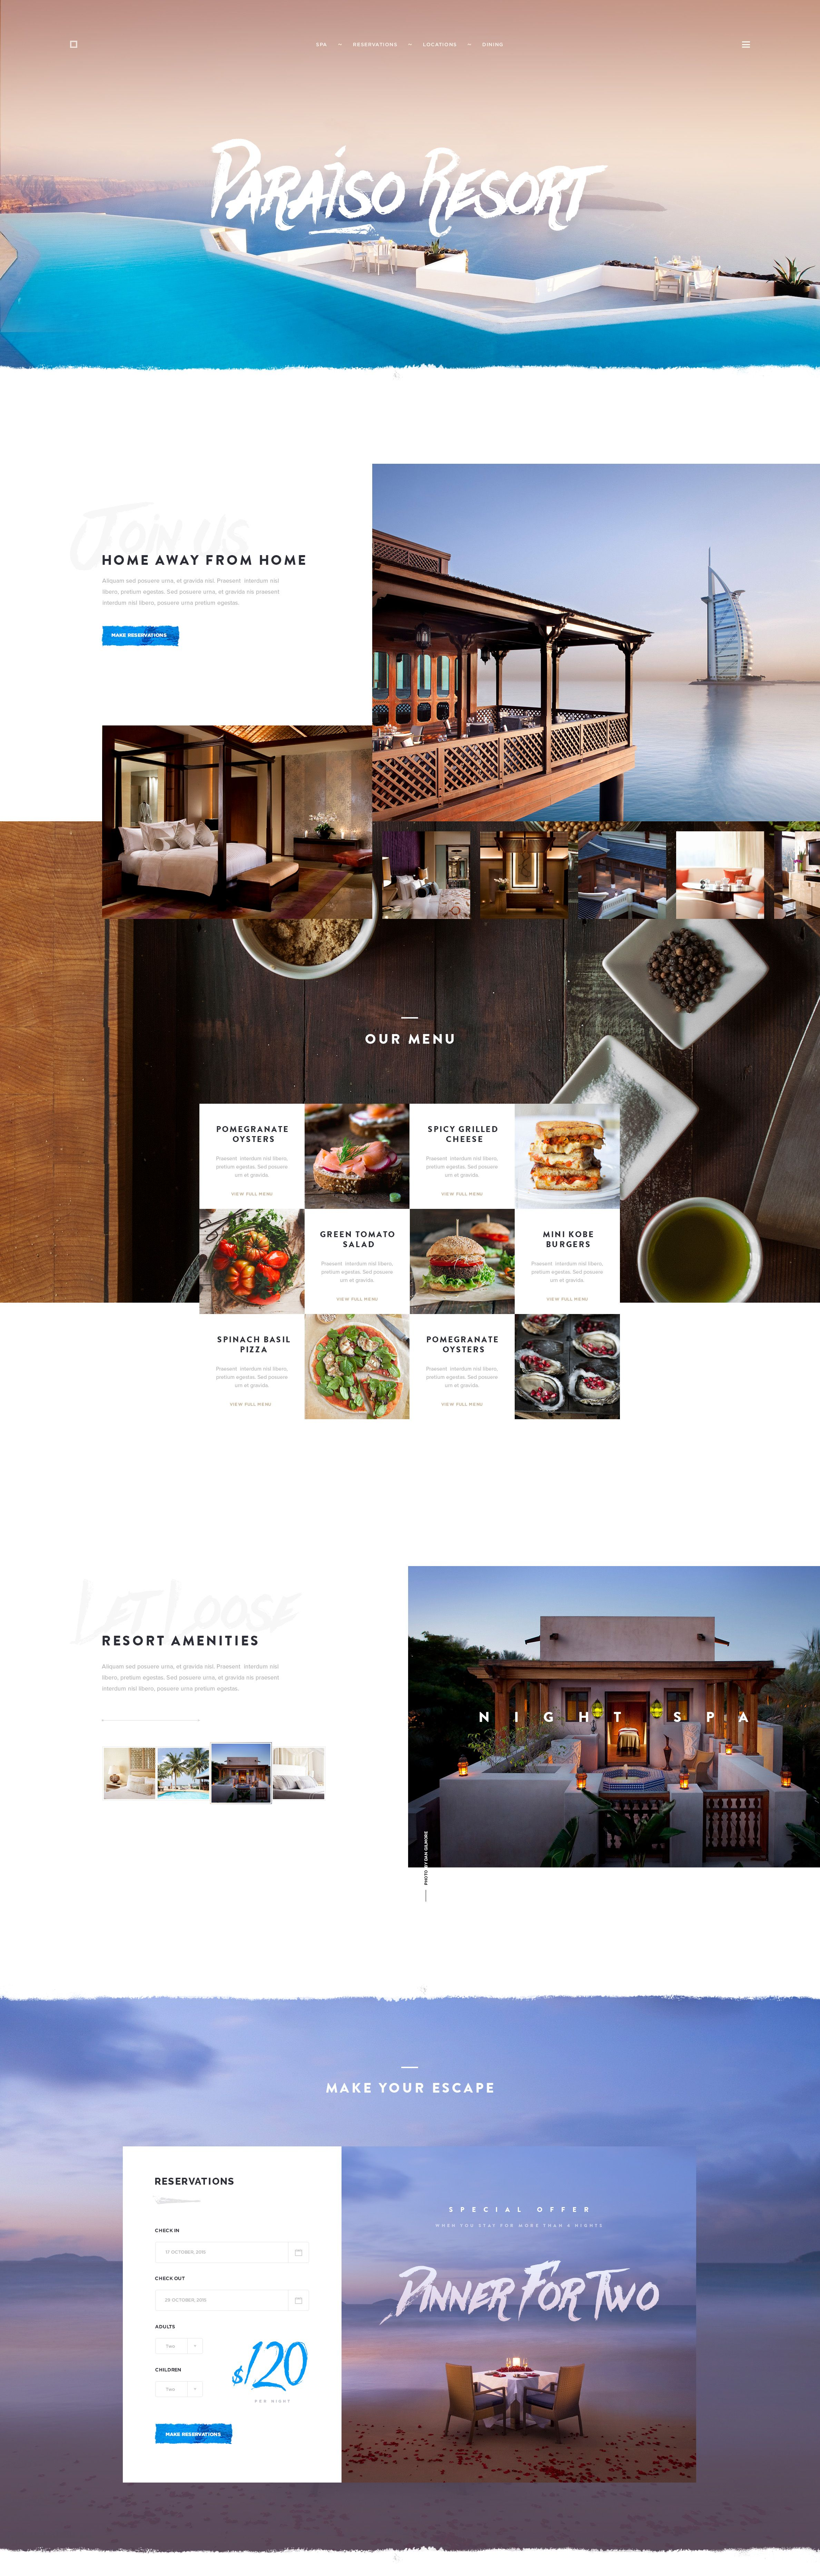 Sandy Jpg By Alex Banaga Digital Marketing Design Web Layout Design Web Graphic Design